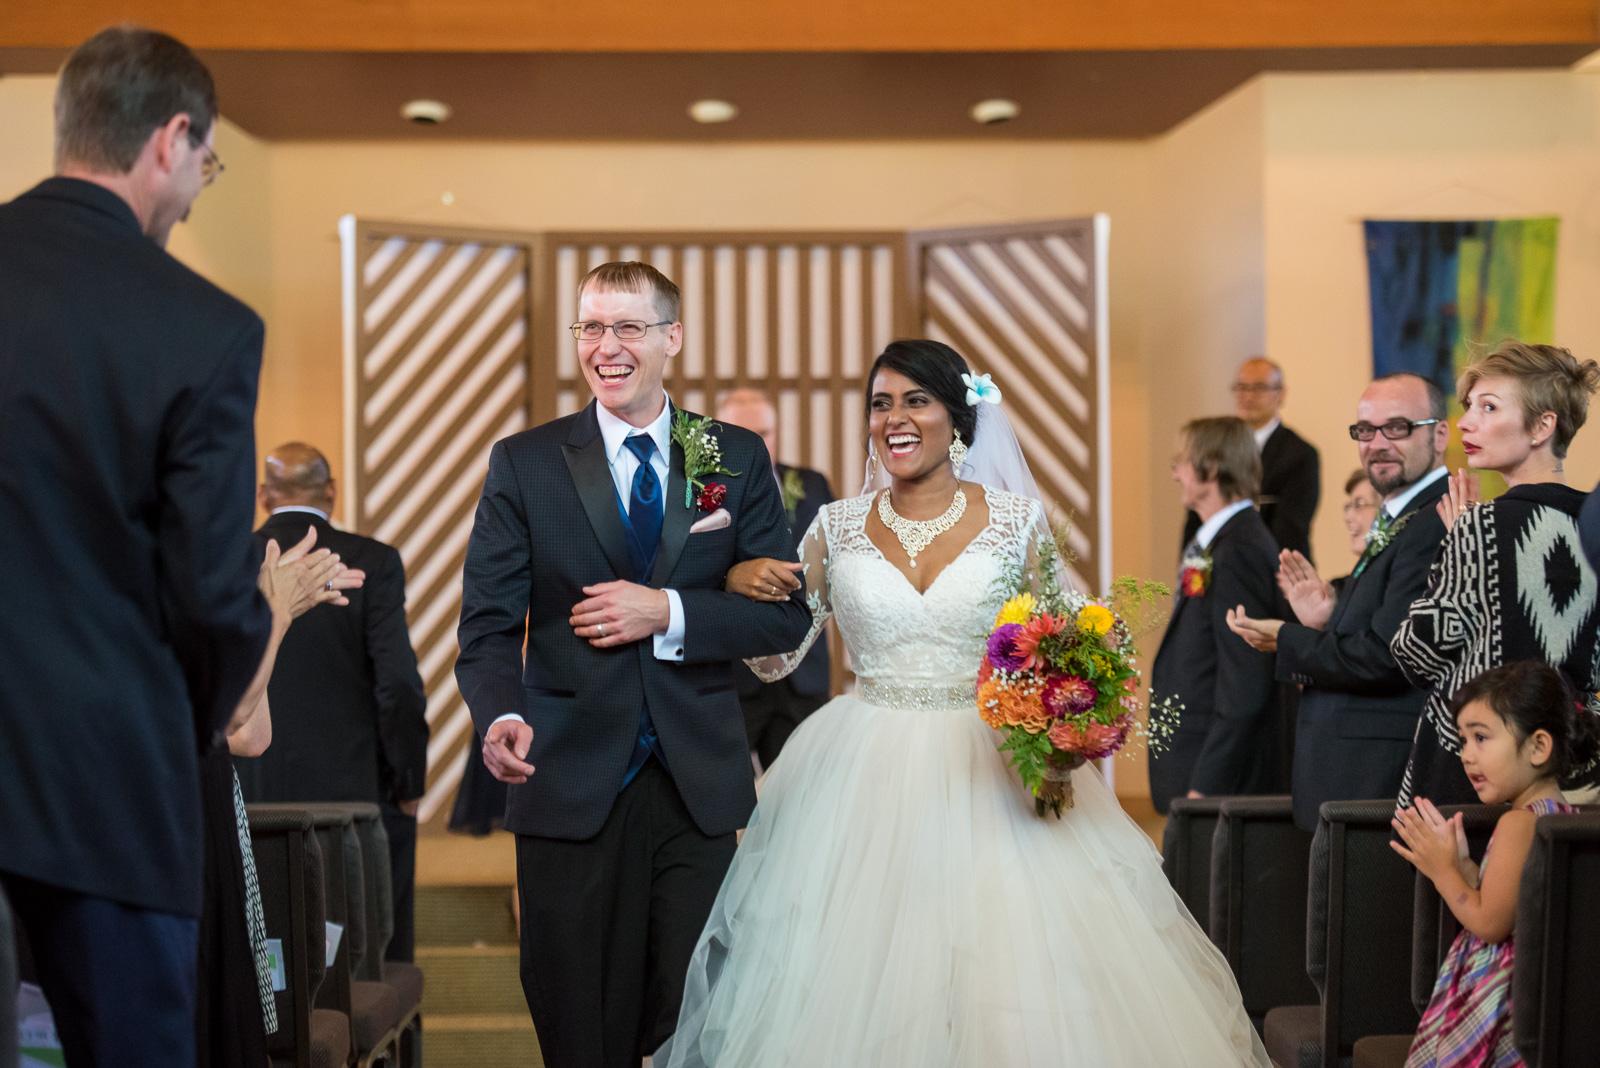 bc-wedding-photographers-paradise-banquet-hall-wedding-18.jpg